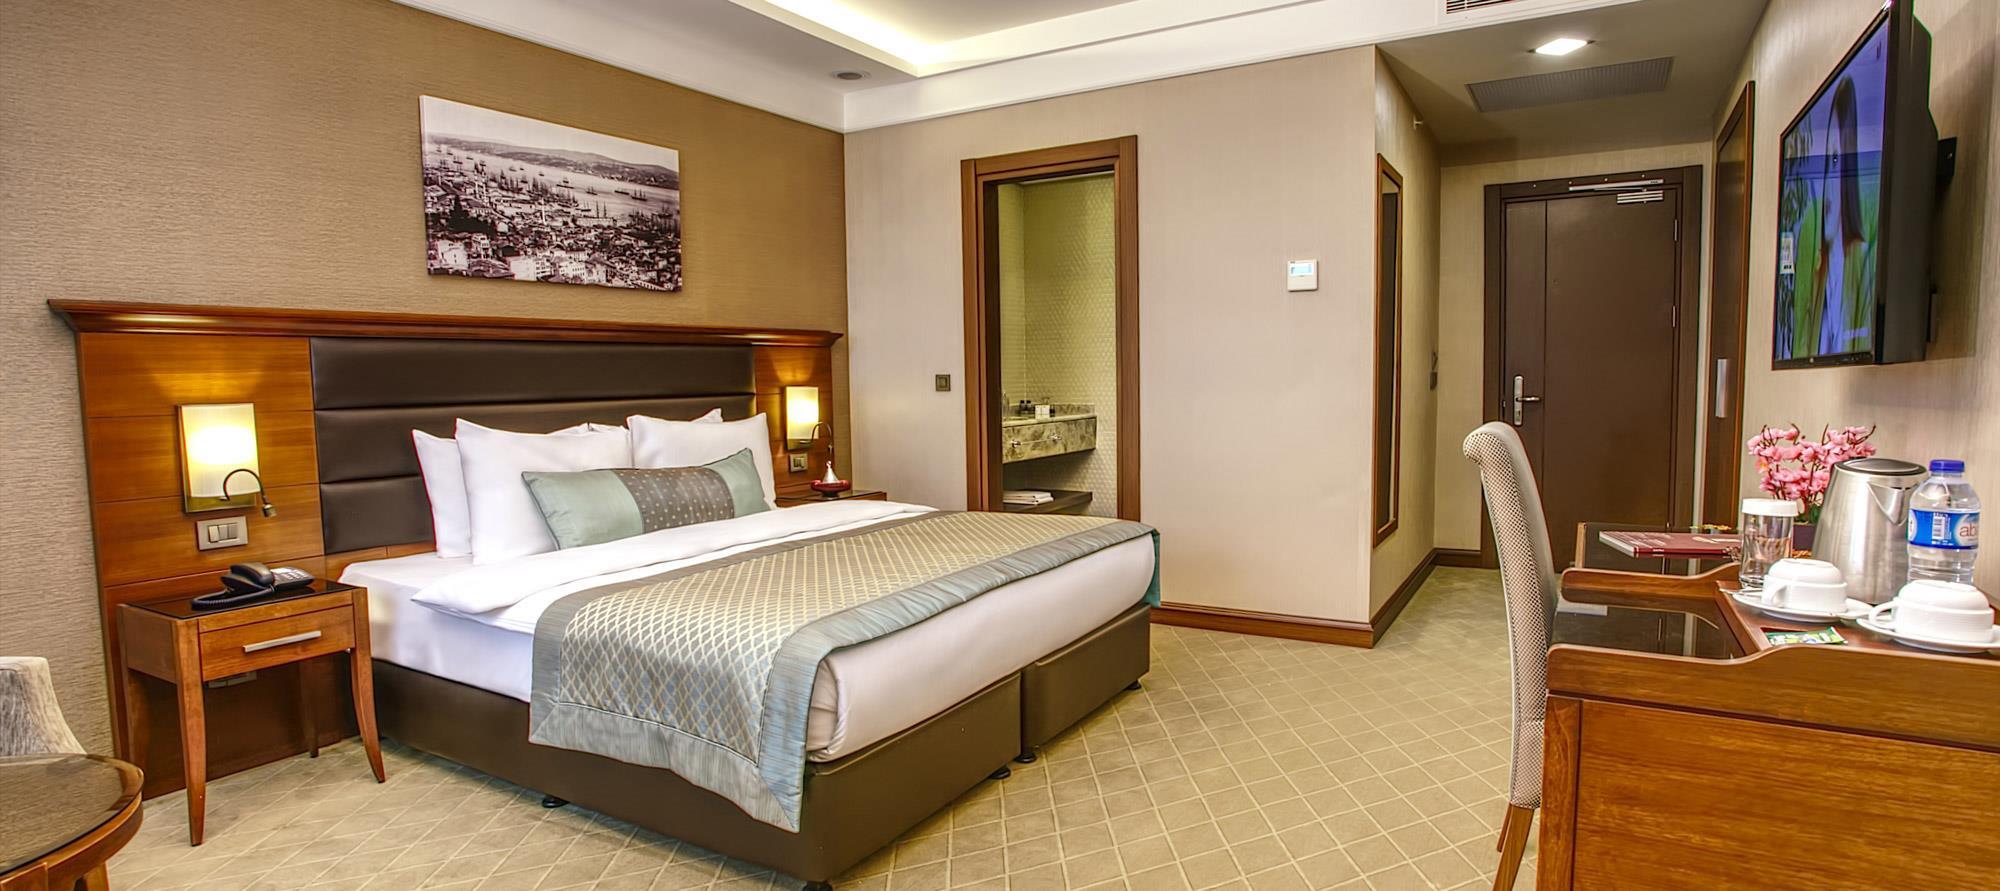 Grand Makel Hotel Topkapi254603